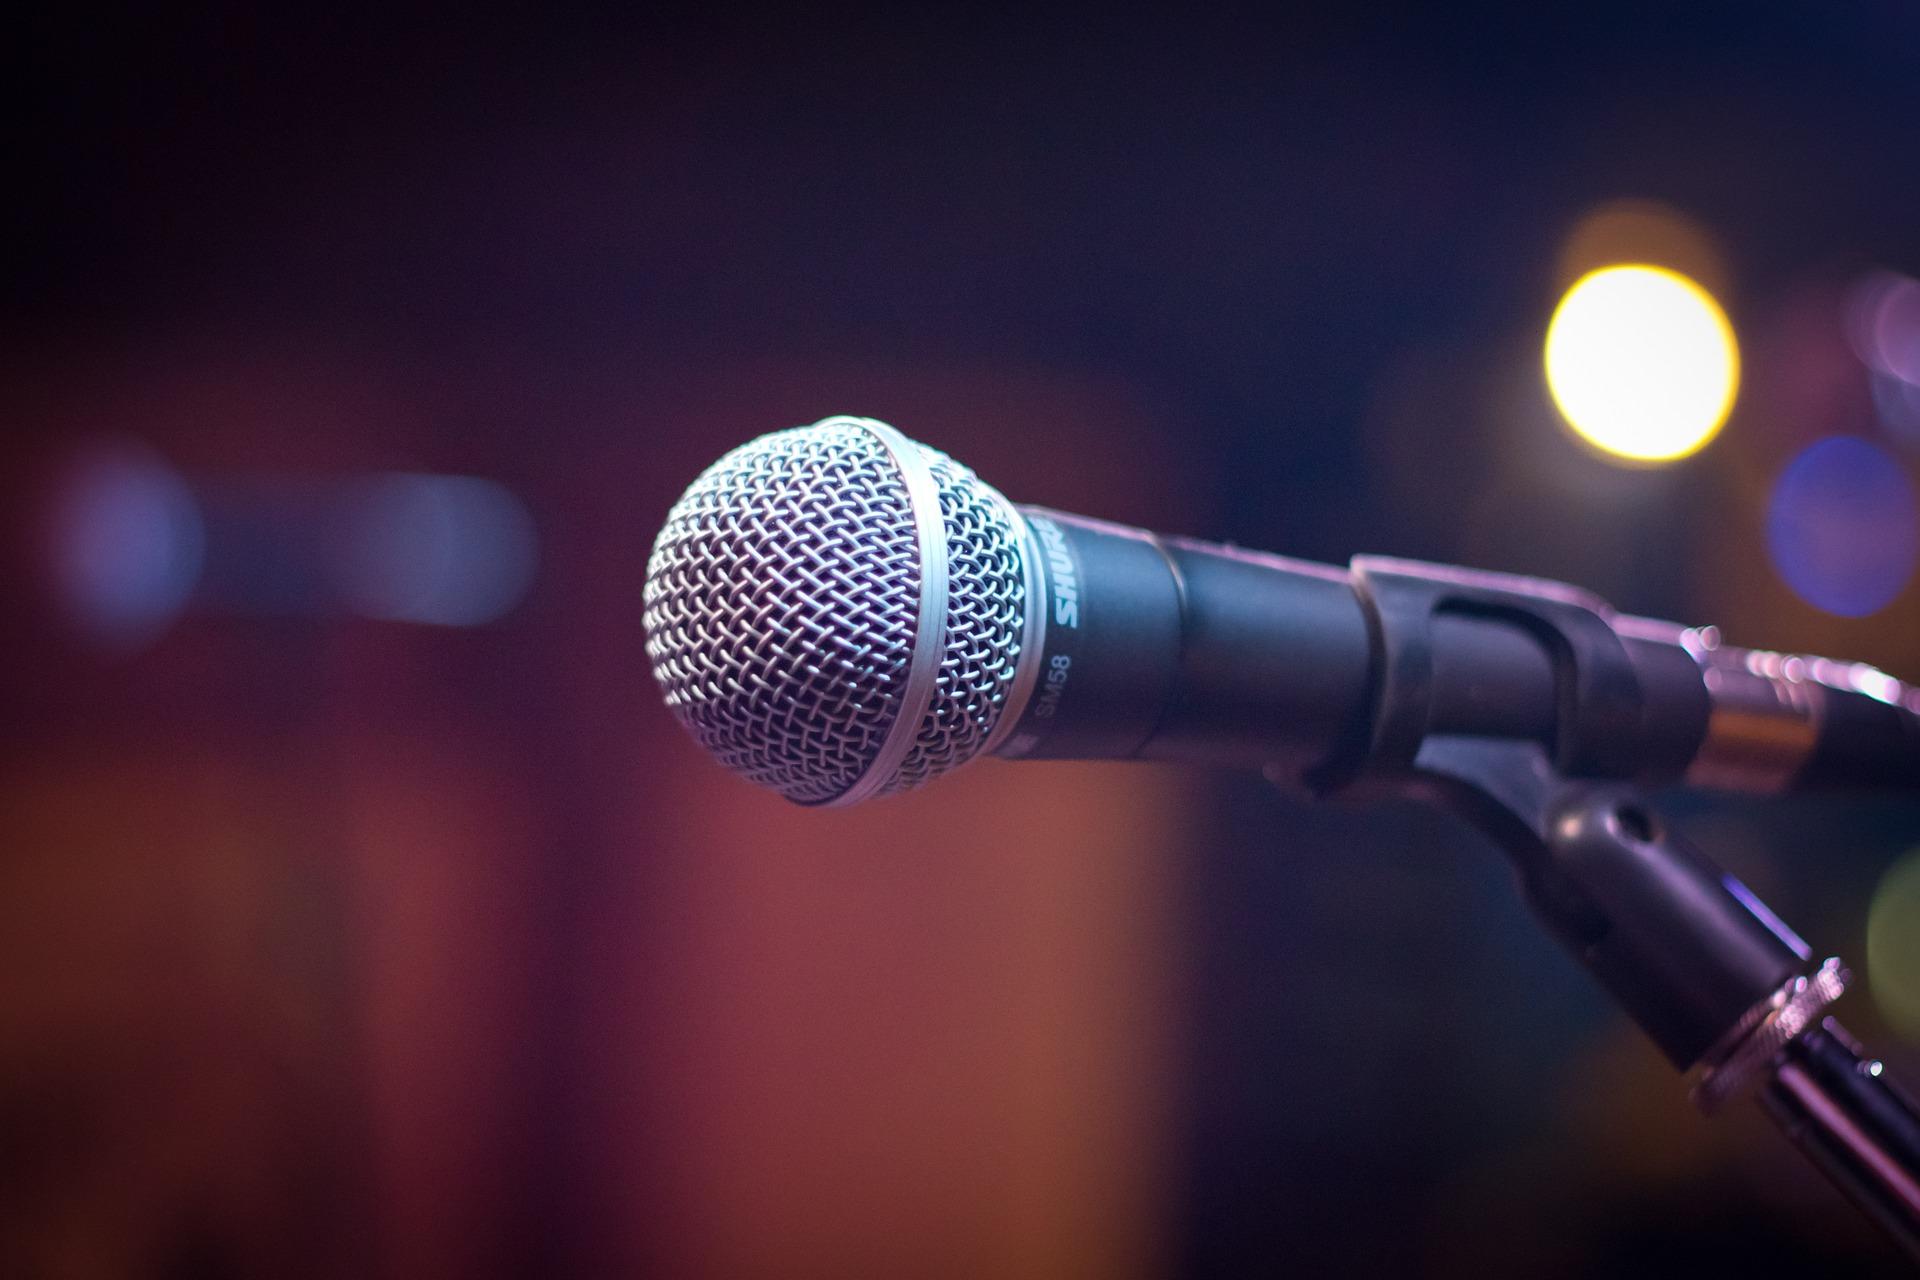 microphone-1261793_1920